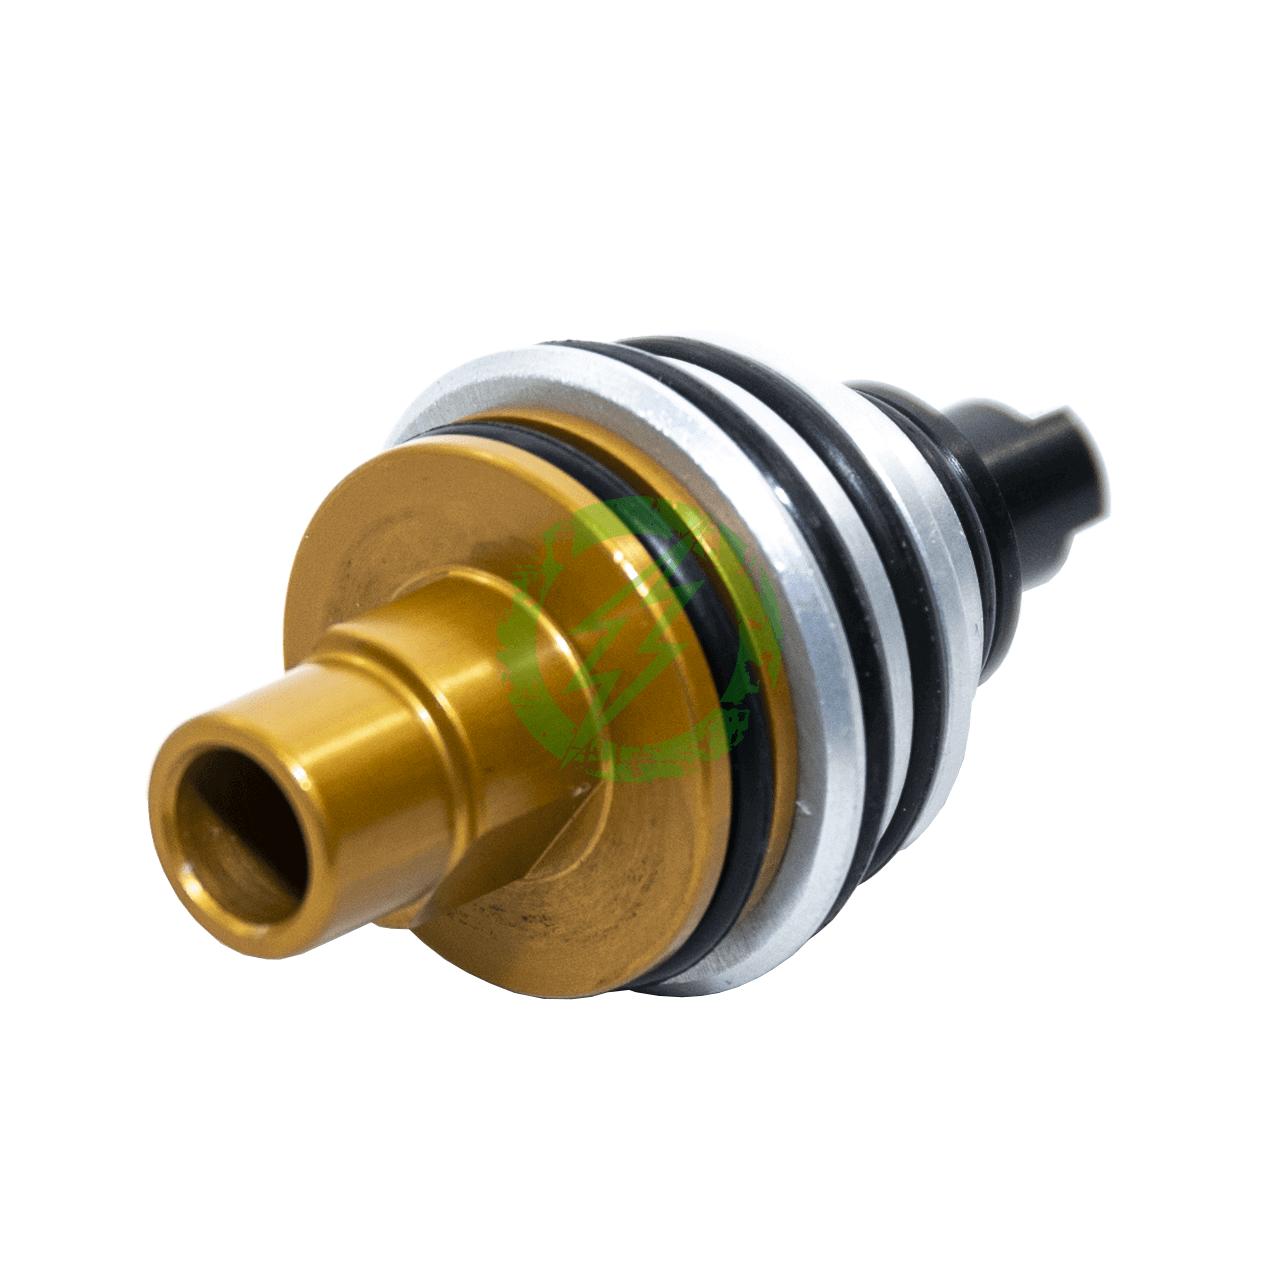 PolarStar Fusion Engine Gold Poppet | Low Flow .0465 top